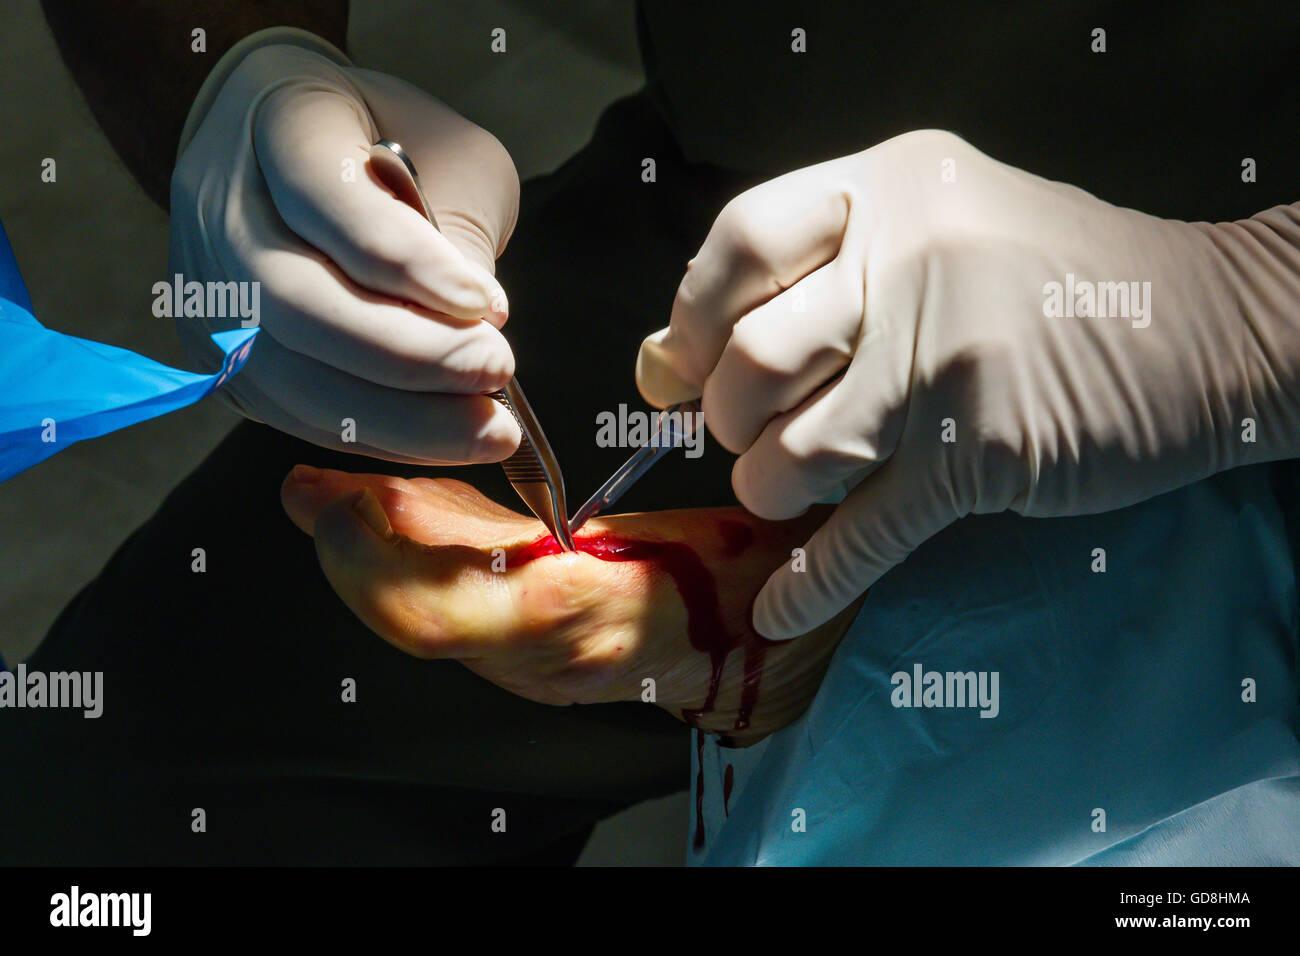 Foot Surgery - Stock Image